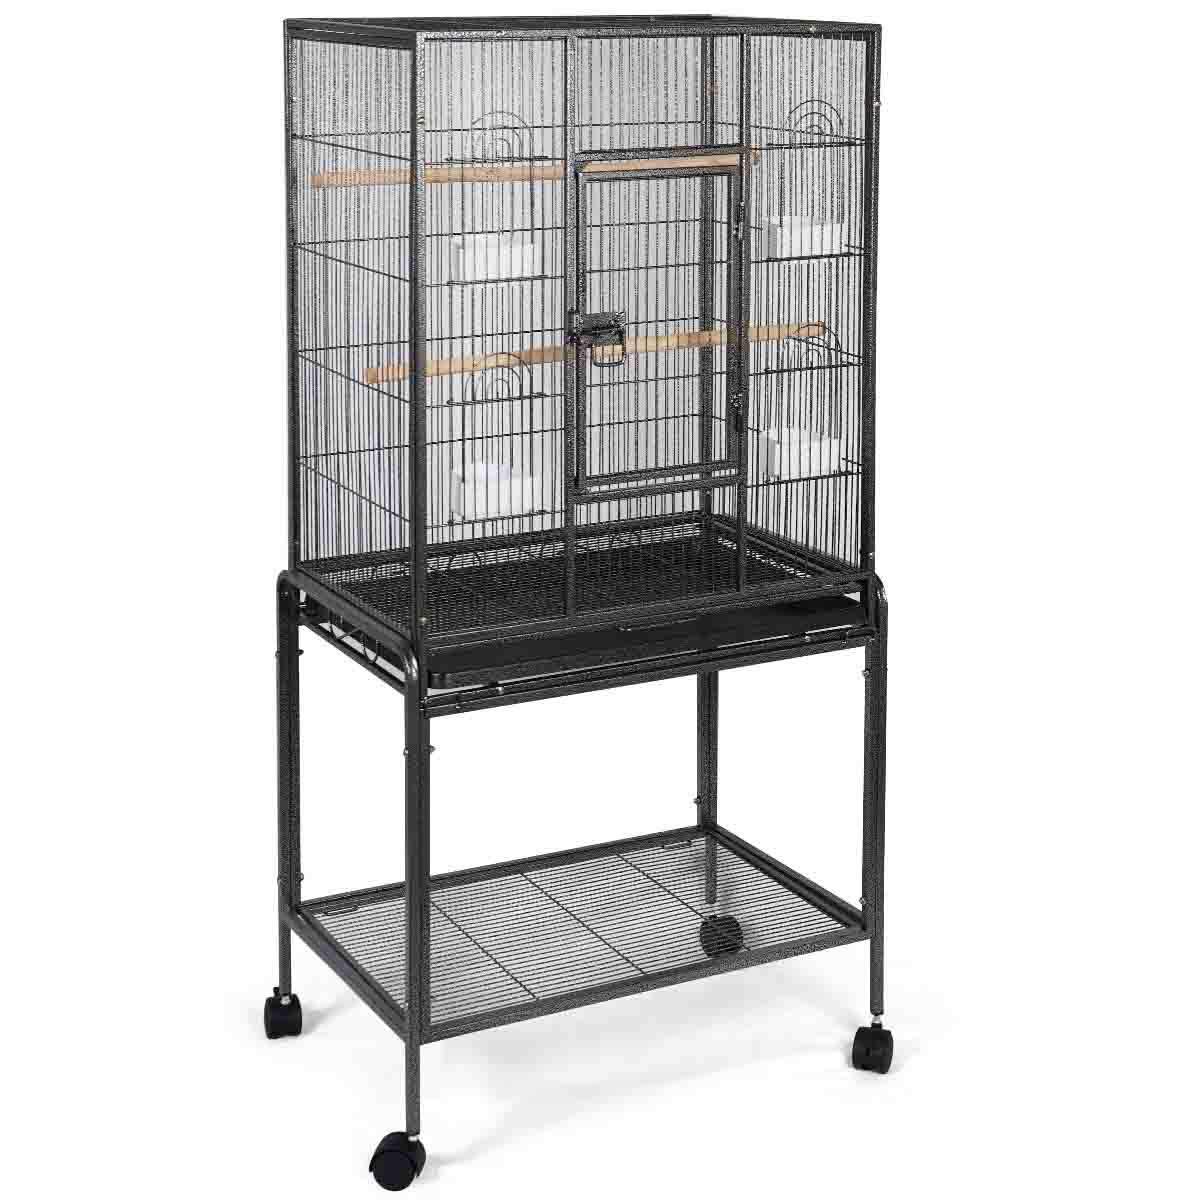 Giantex Bird Parrot Cage Chinchilla Cockatiel Conure Large Cockatiel House Metal Wheels PS5340New